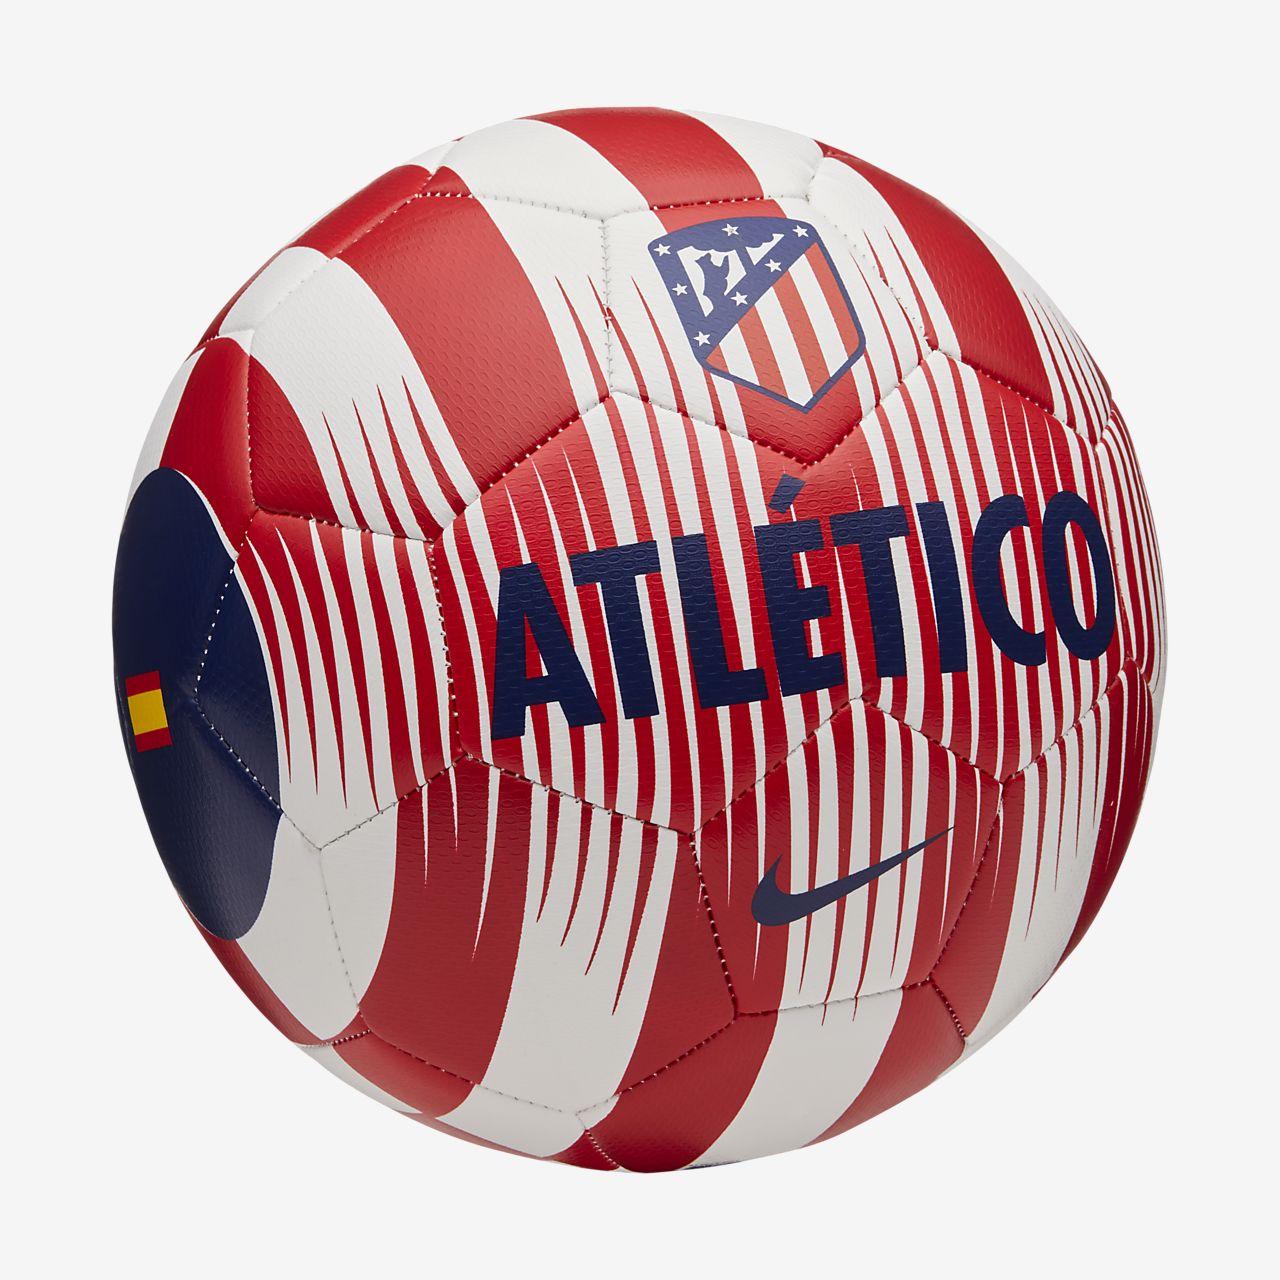 a6a7443767a59 Balón de fútbol Atletico de Madrid Prestige. Nike.com MX